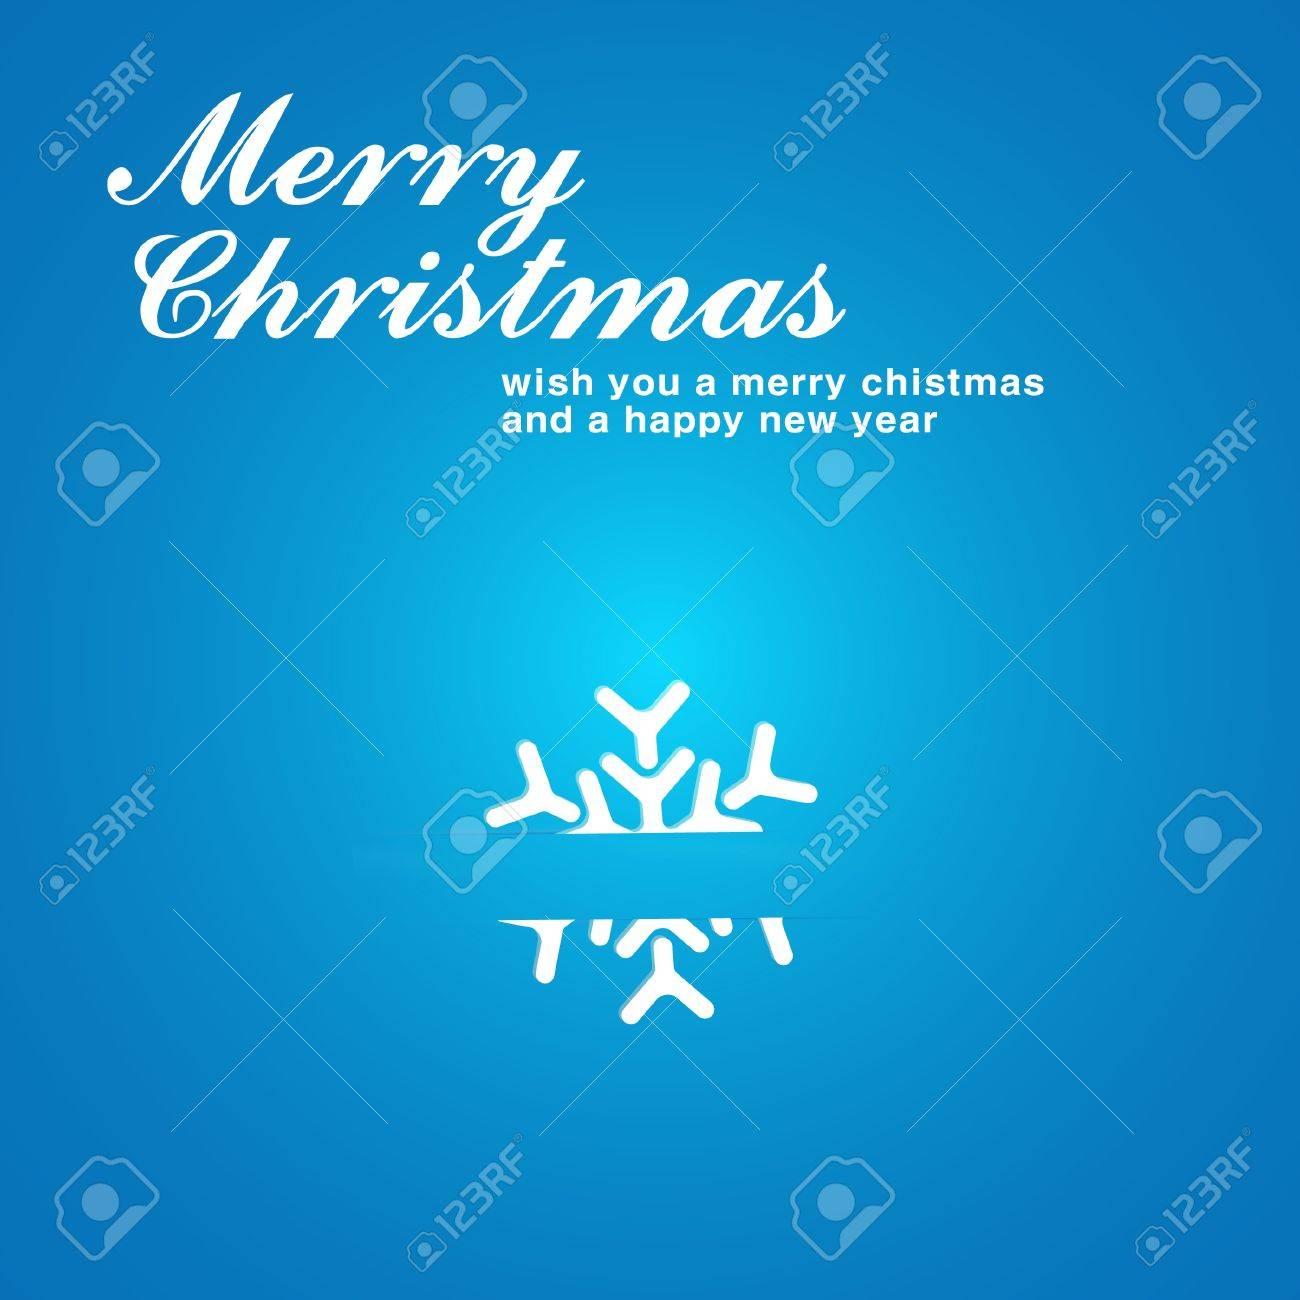 Christmas Snowflake Applique Background Stock Vector - 15756695